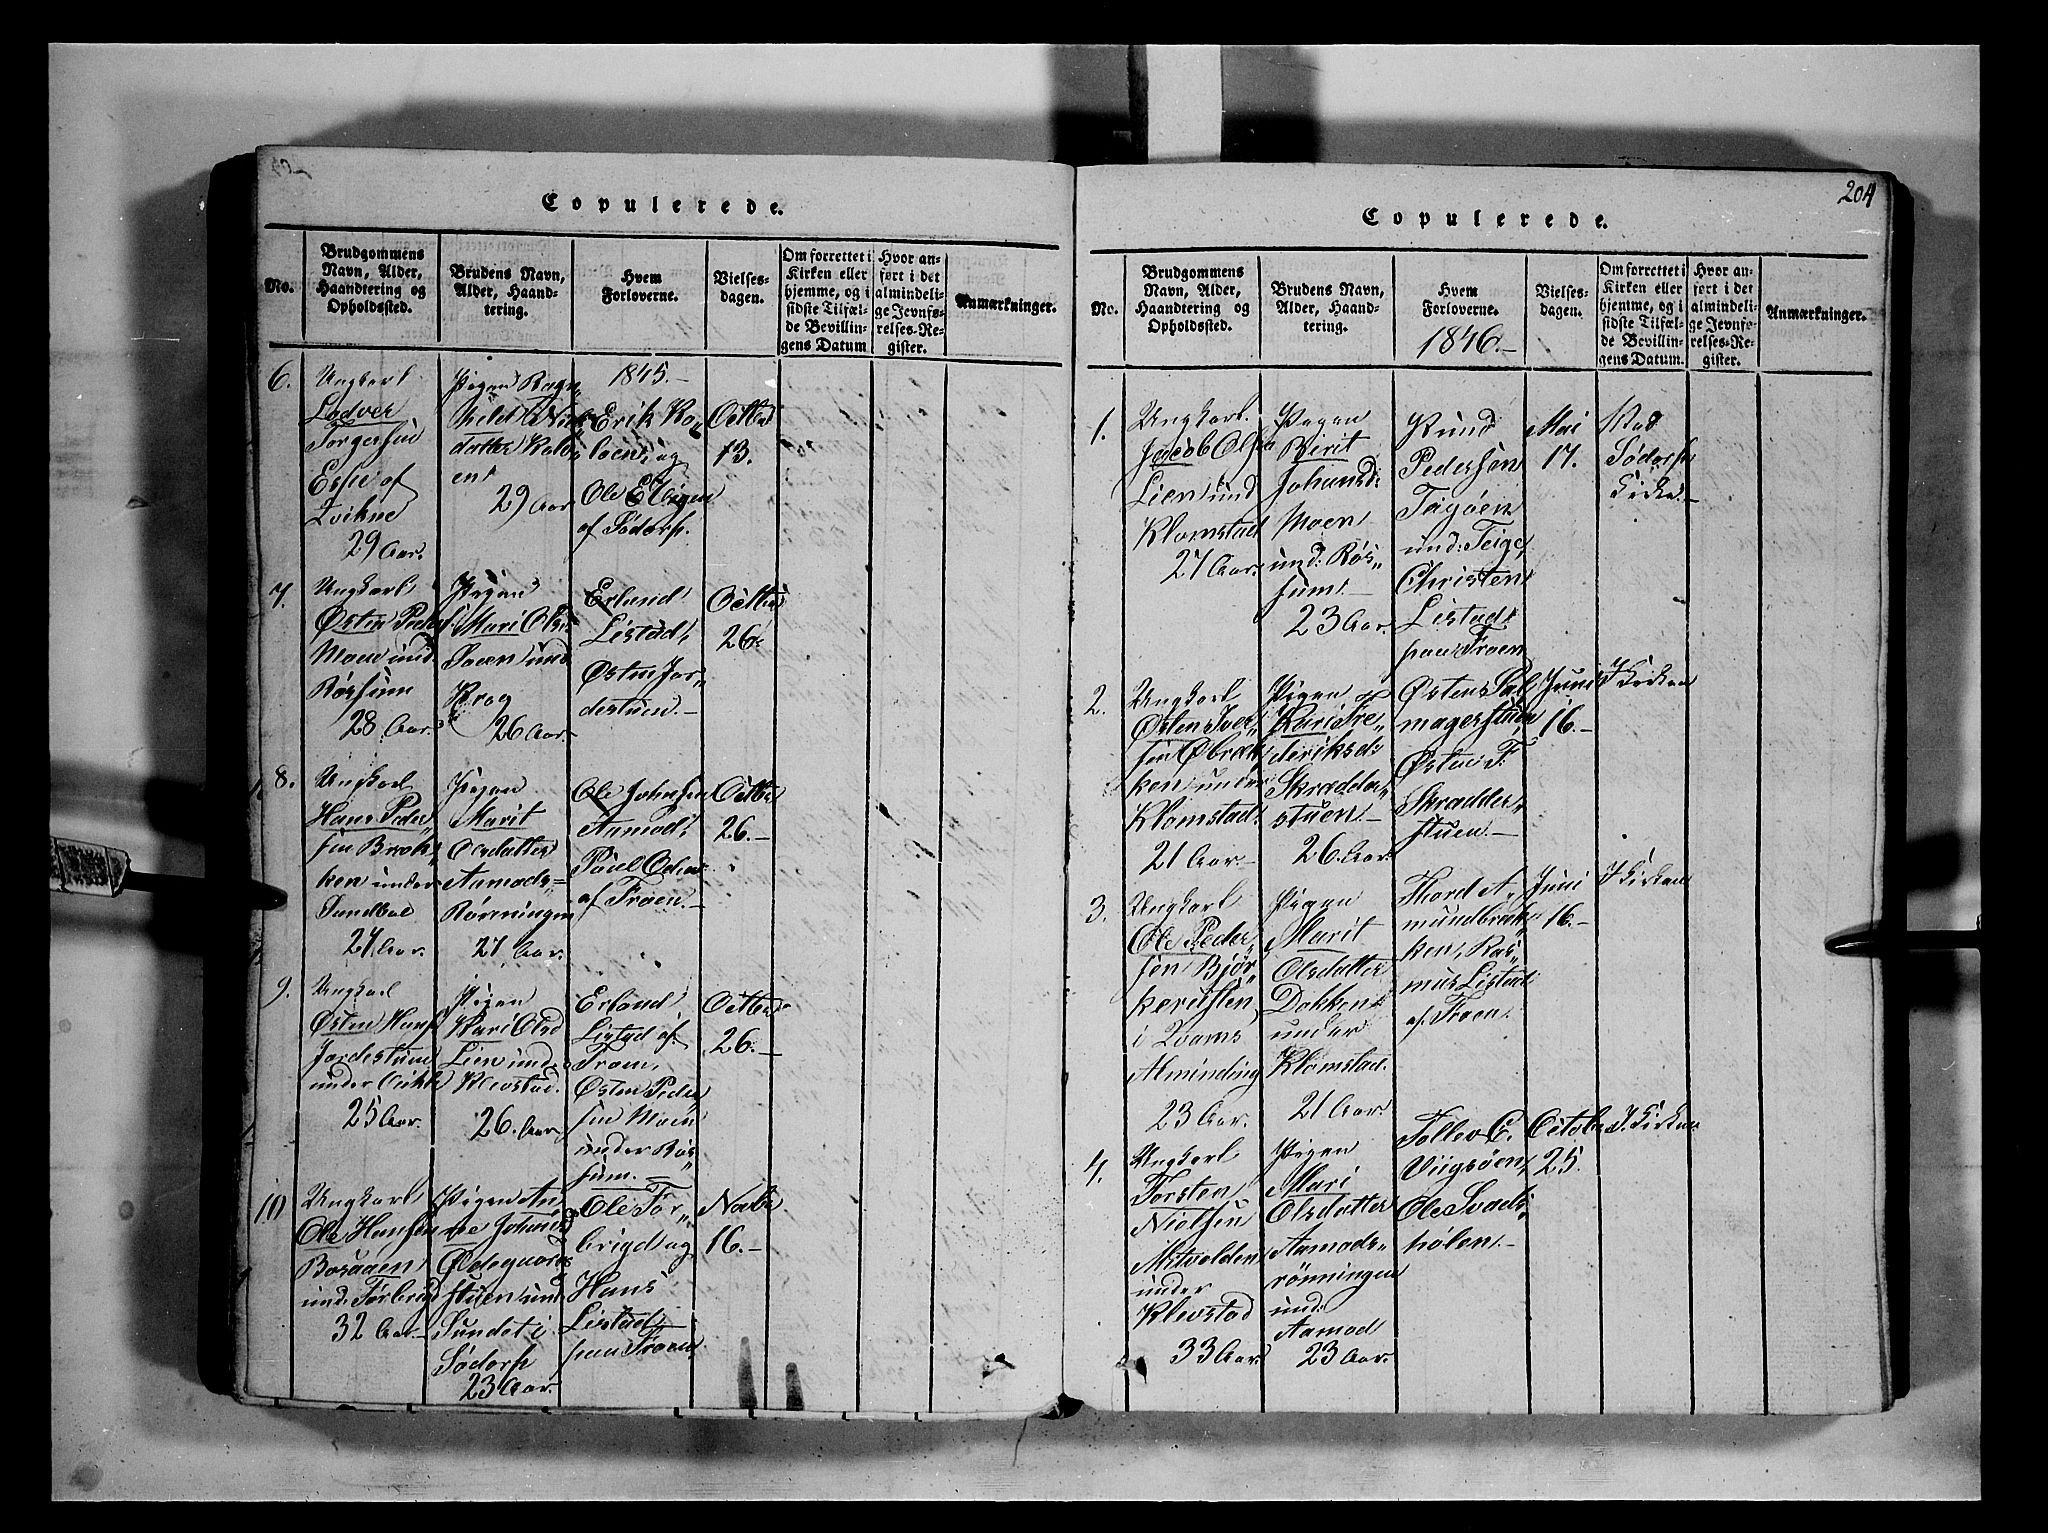 SAH, Fron prestekontor, H/Ha/Hab/L0002: Klokkerbok nr. 2, 1816-1850, s. 204